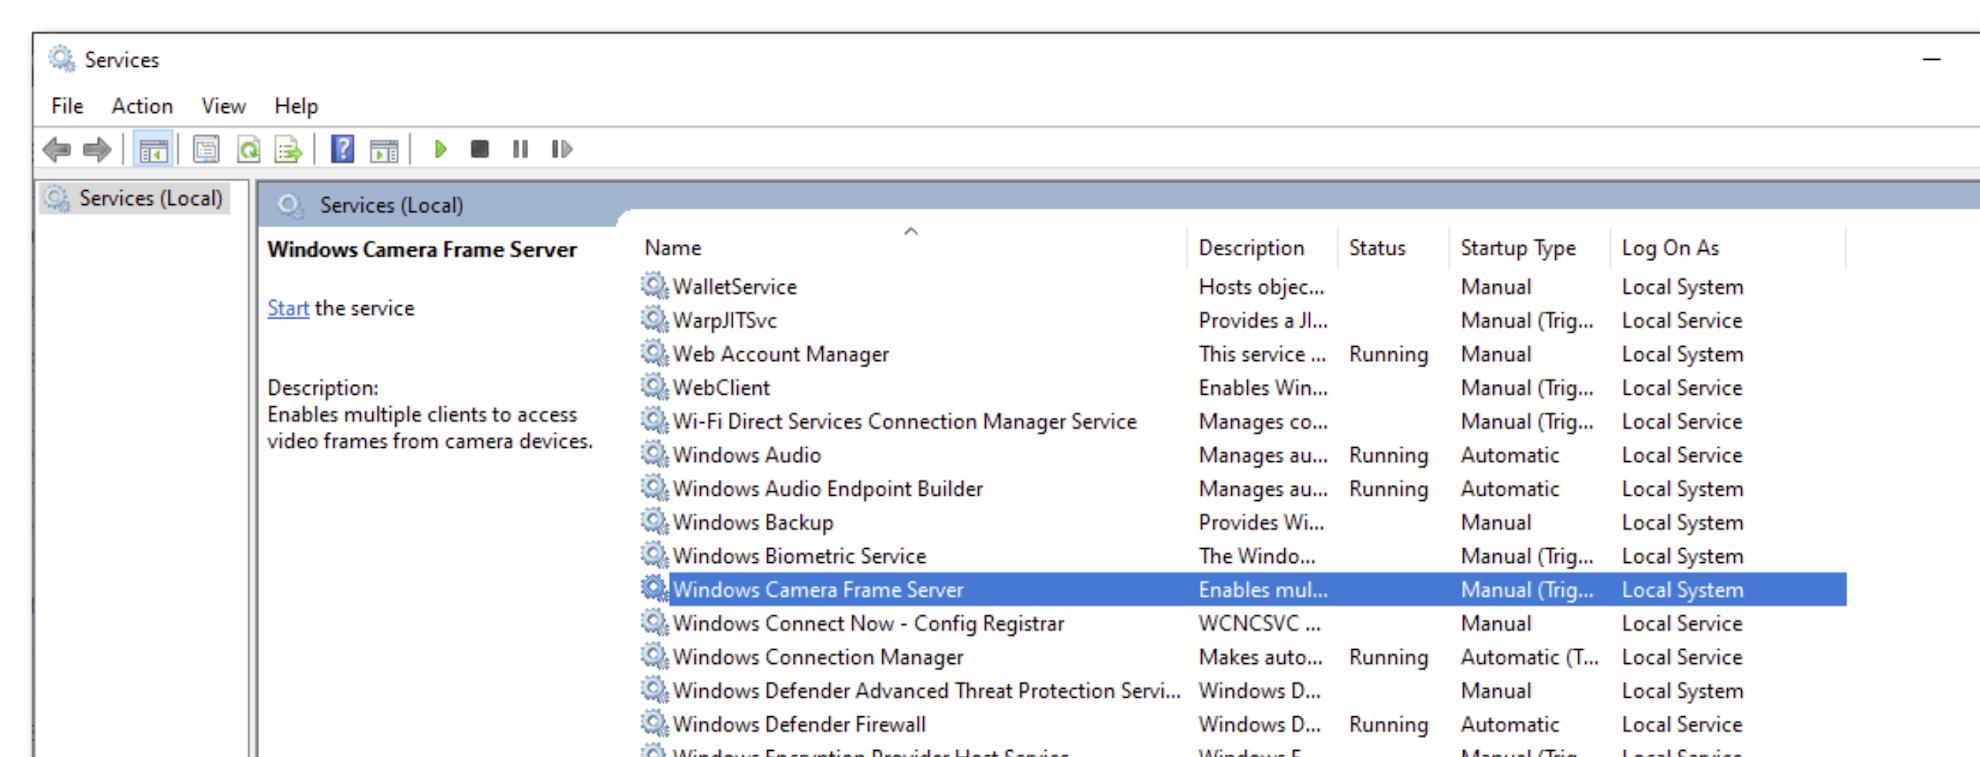 Locate Windows Camera Frame Server service